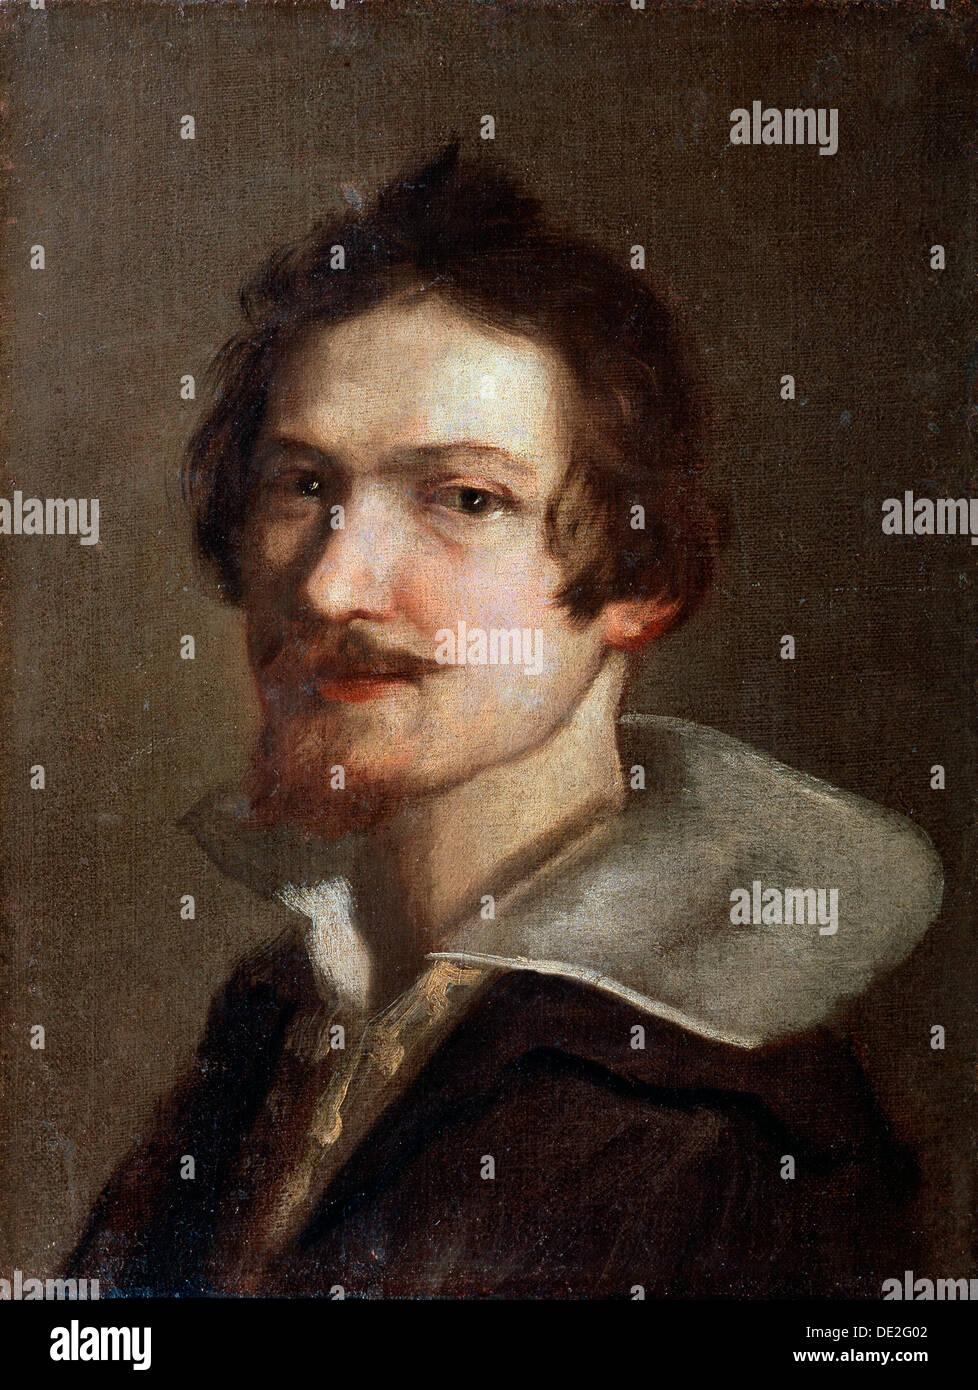 'Self-portrait', 17th century. Artist: Gian Lorenzo Bernini - Stock Image